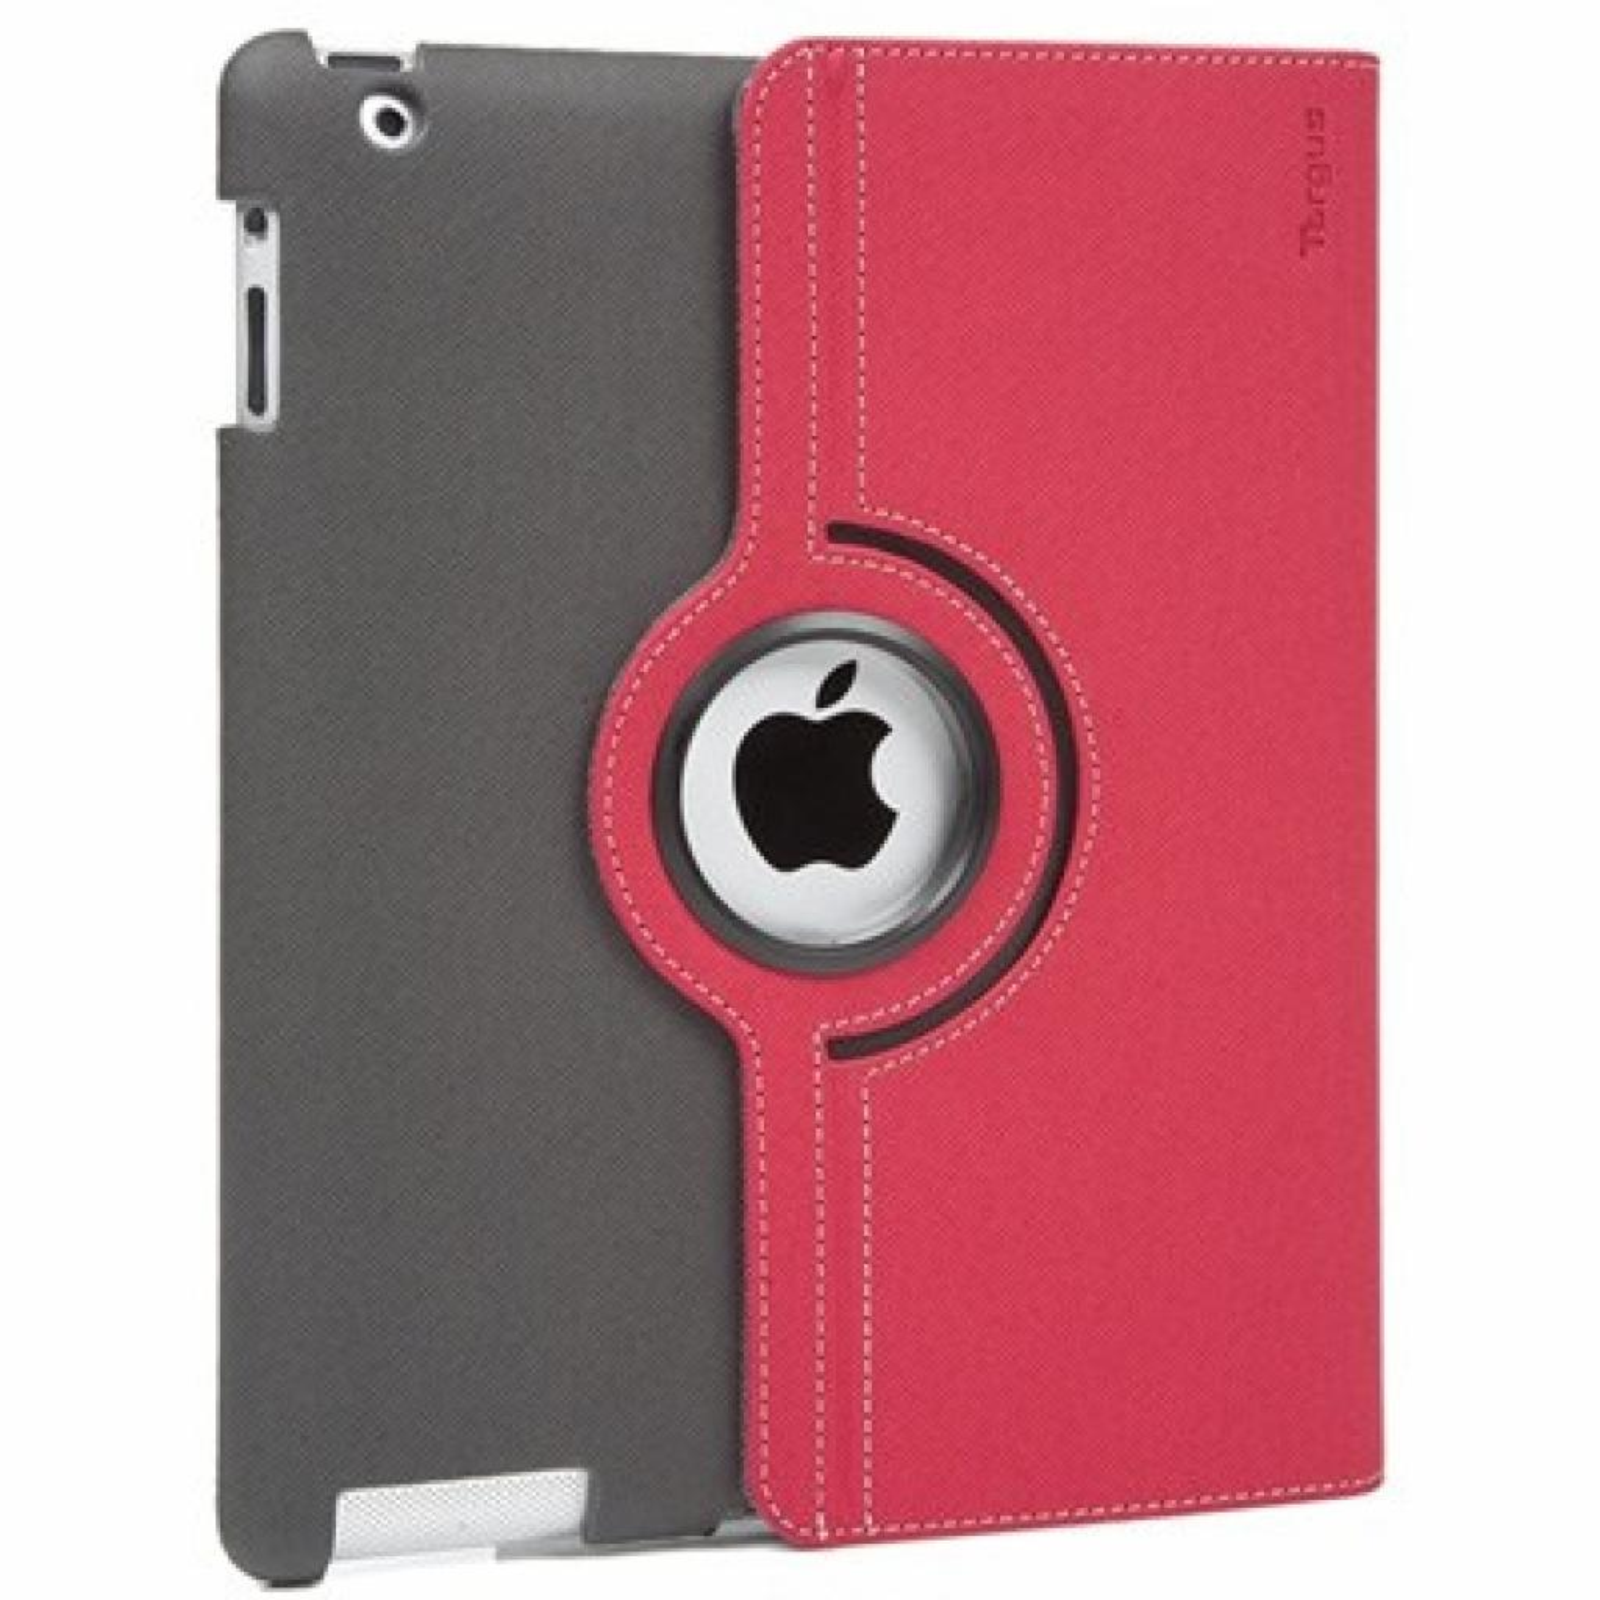 Чехол для планшета Targus iPad3 Versavu 360° Rotating Stand & Case (THZ15606EU-50)